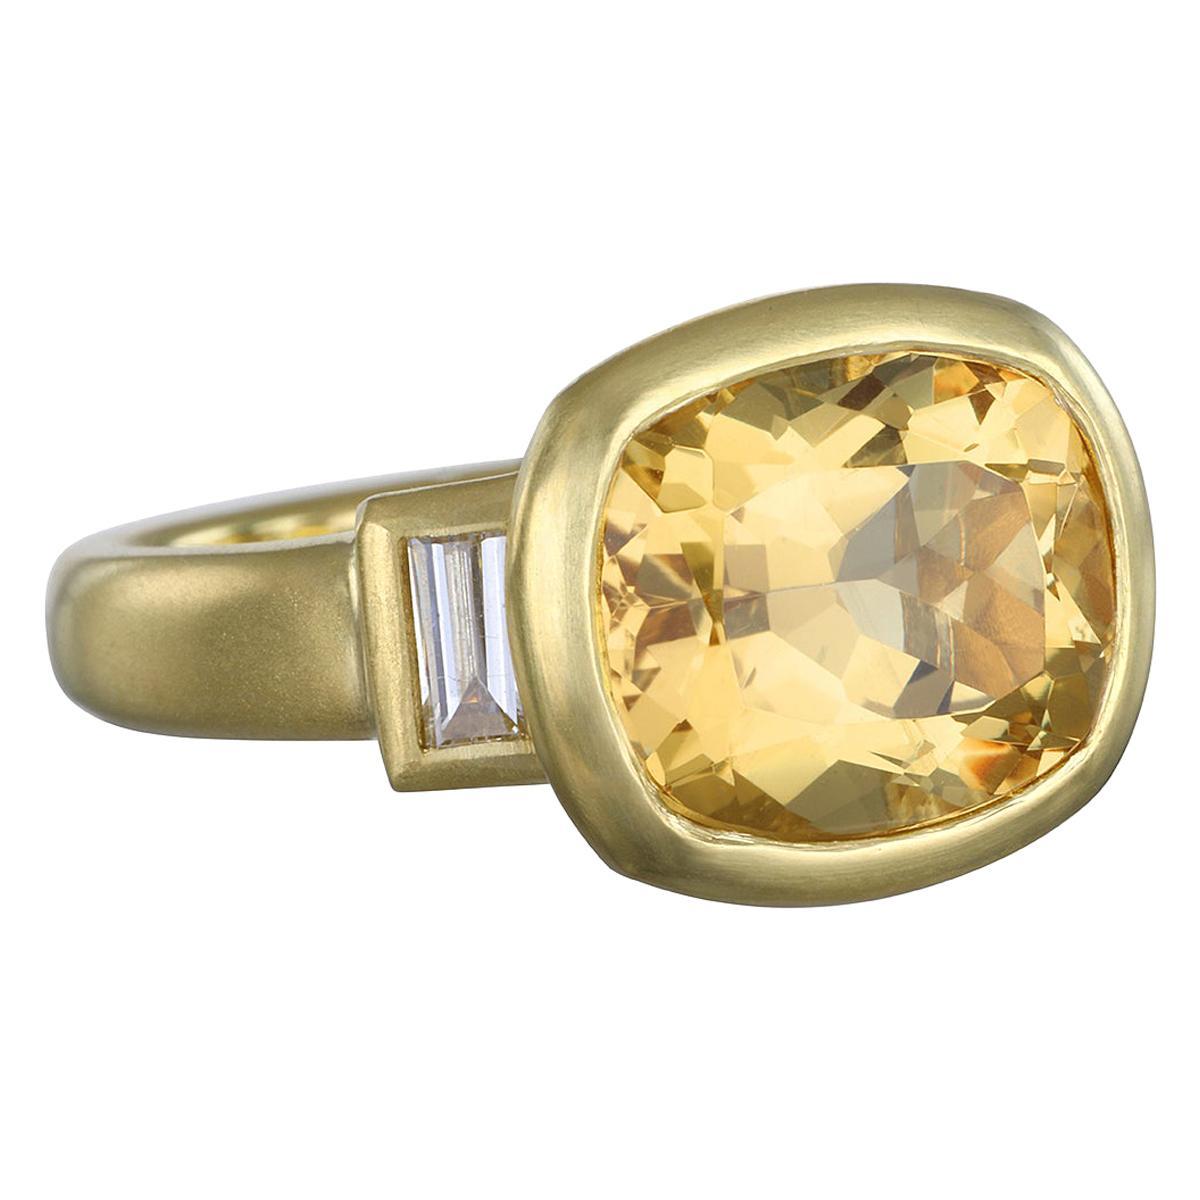 Faye Kim 18k Gold Antique Cushion Golden Beryl and Diamond Ring Three-Stone Ring